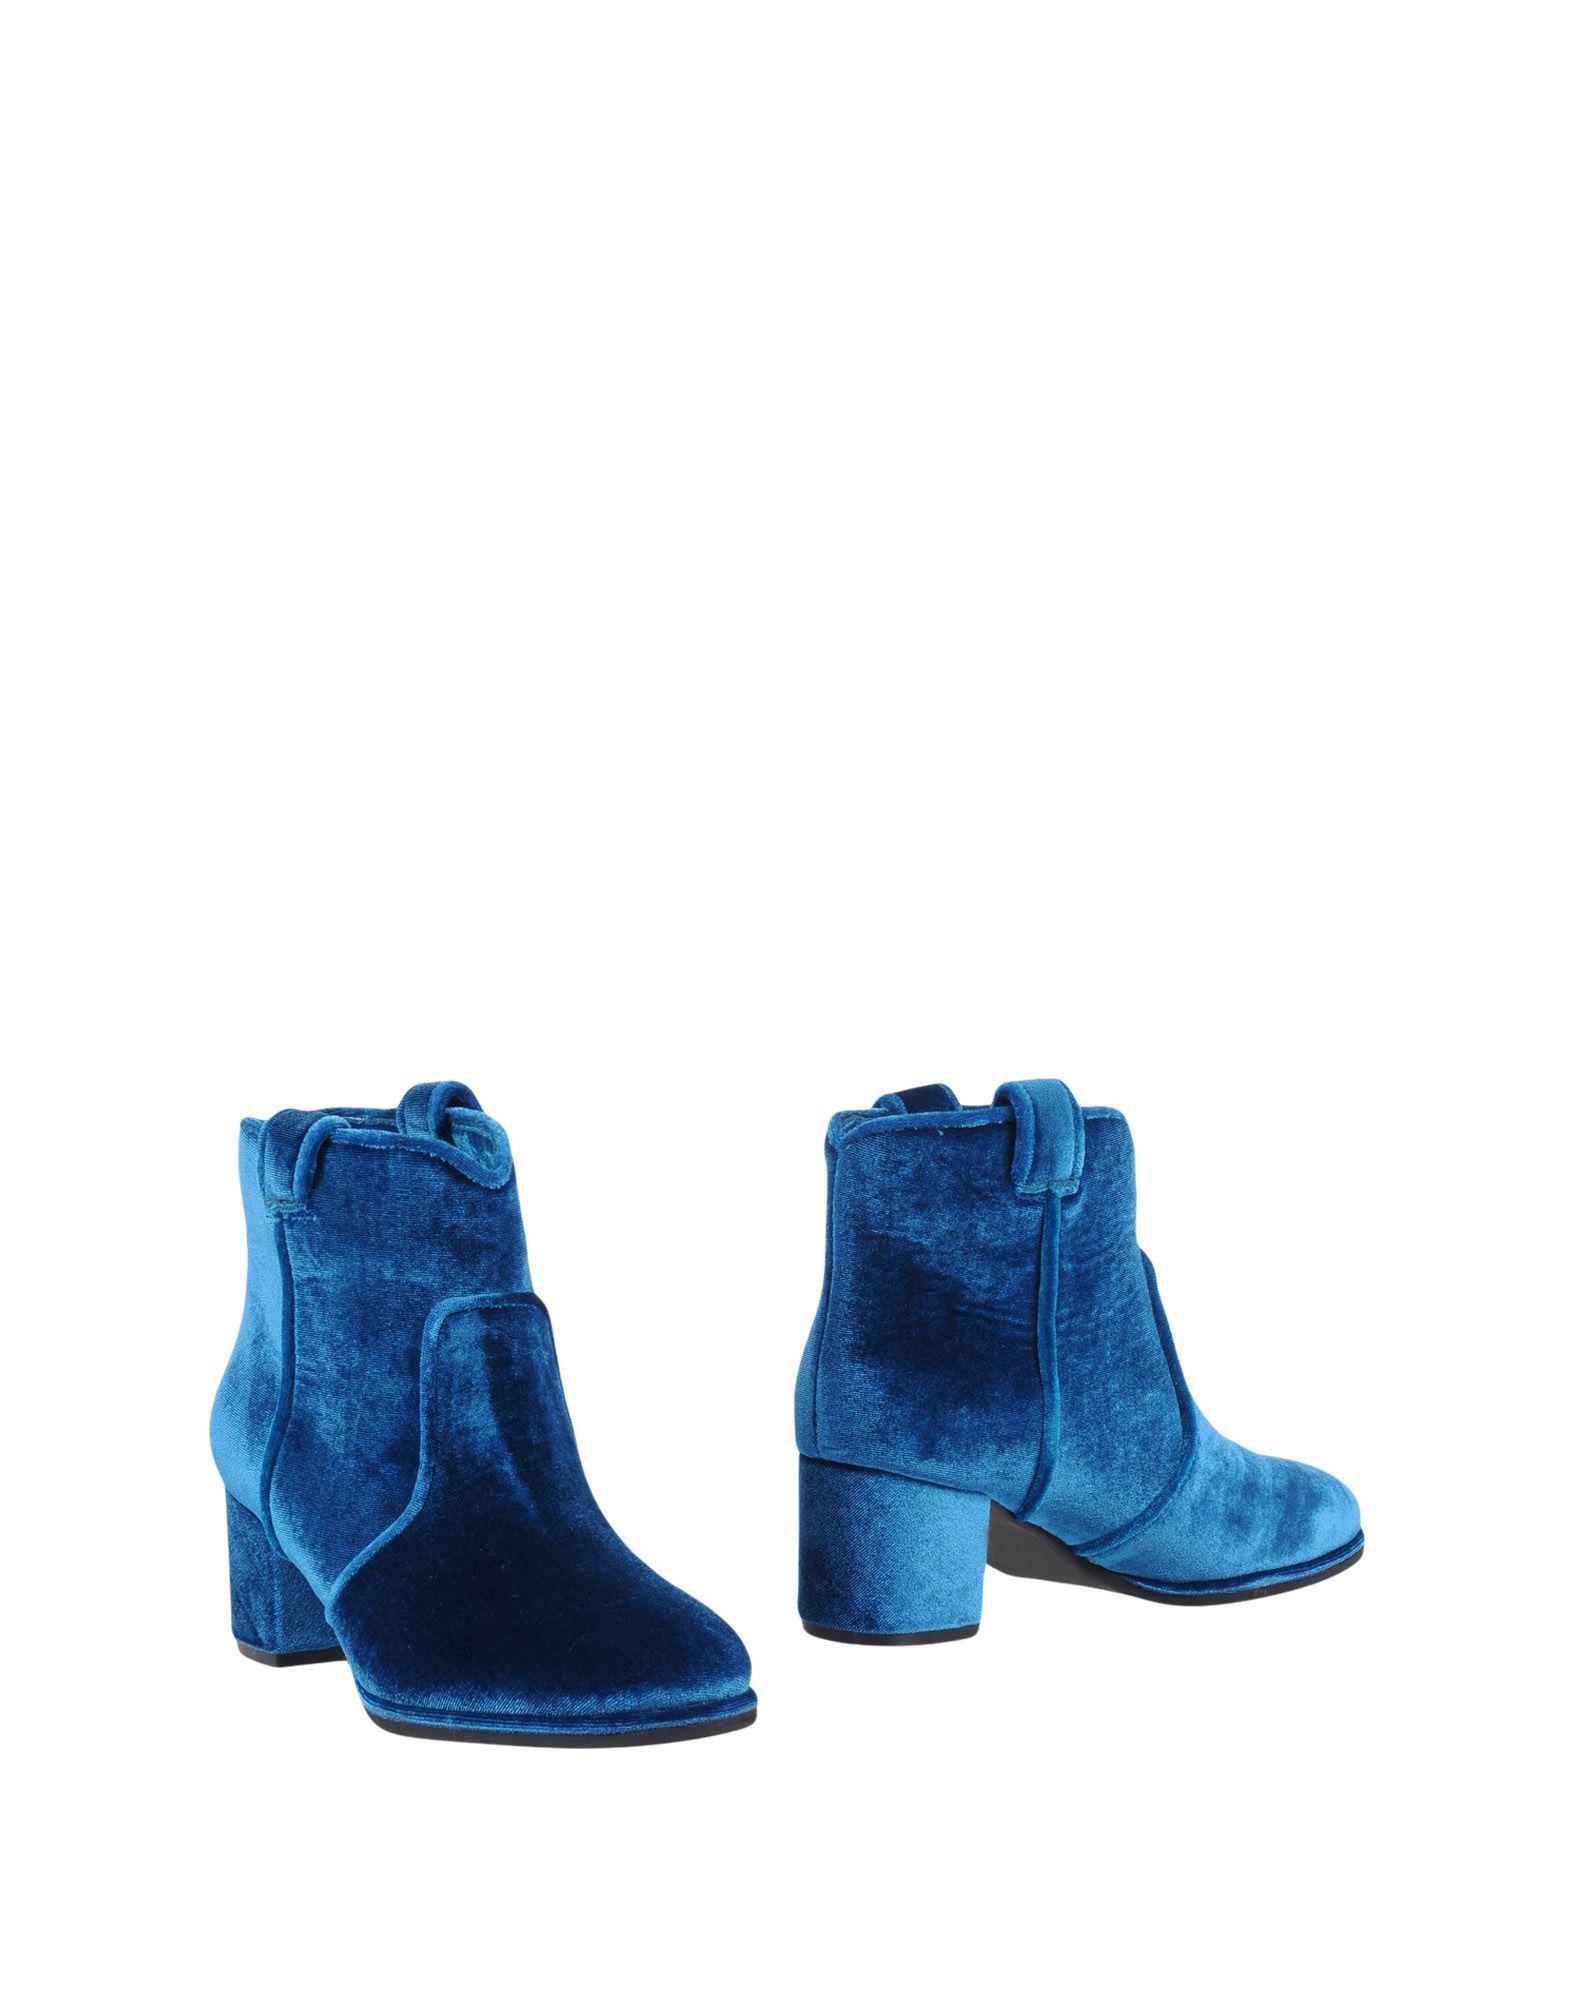 Jeffrey Campbell Stiefelette Damen  11455554JU Gute Qualität beliebte Schuhe